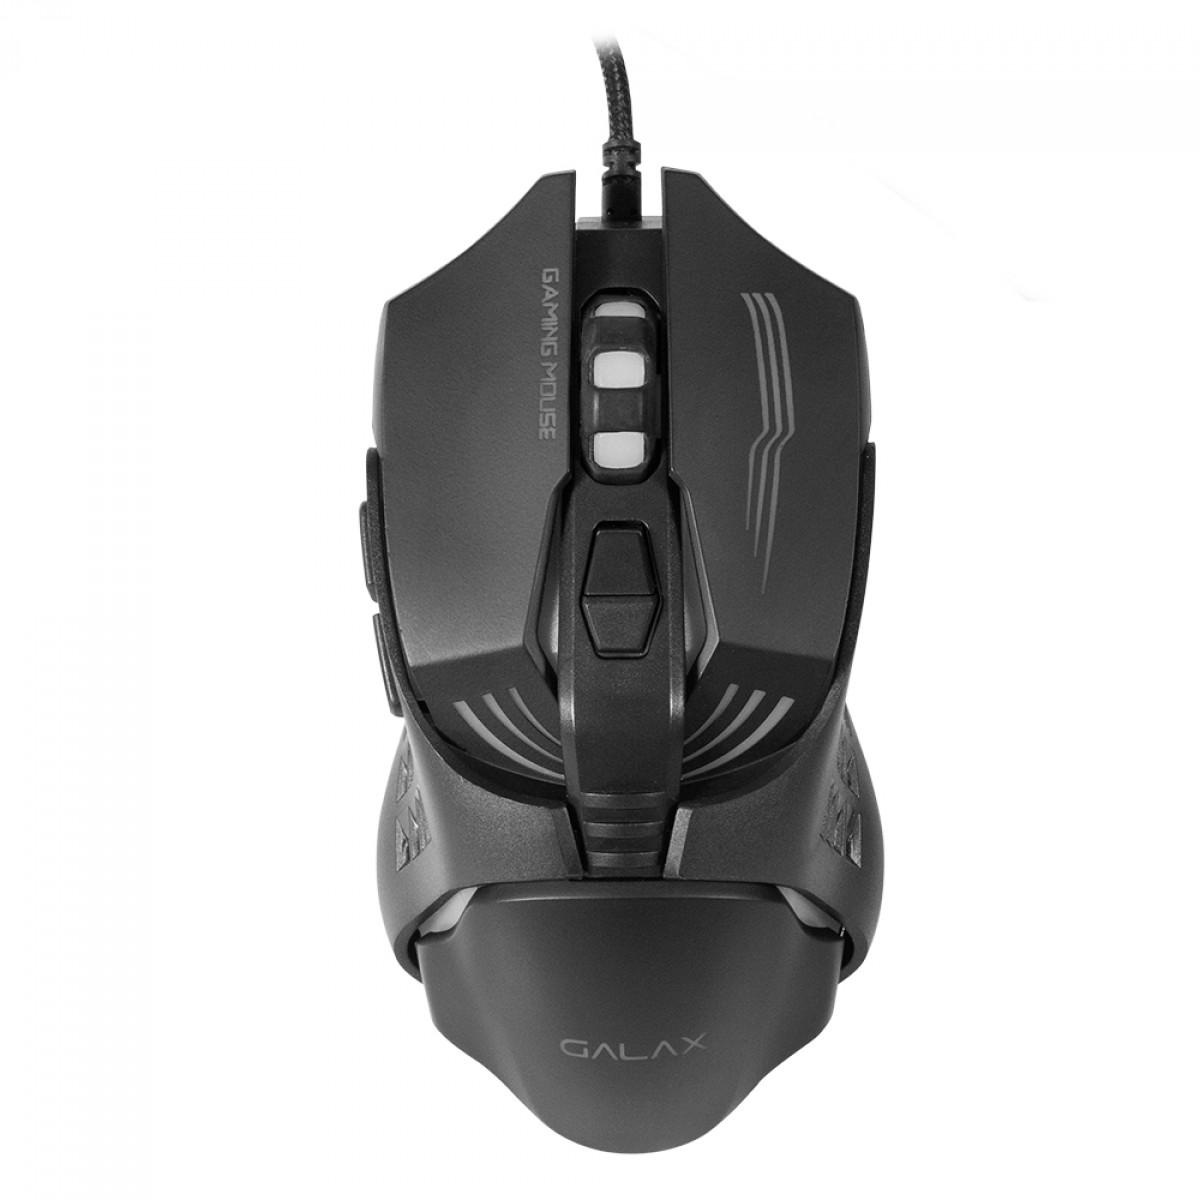 Mouse Gamer Galax Slider-02, 3200 DPI, 6 Botões, Black, MGS02S1A6RG2B0